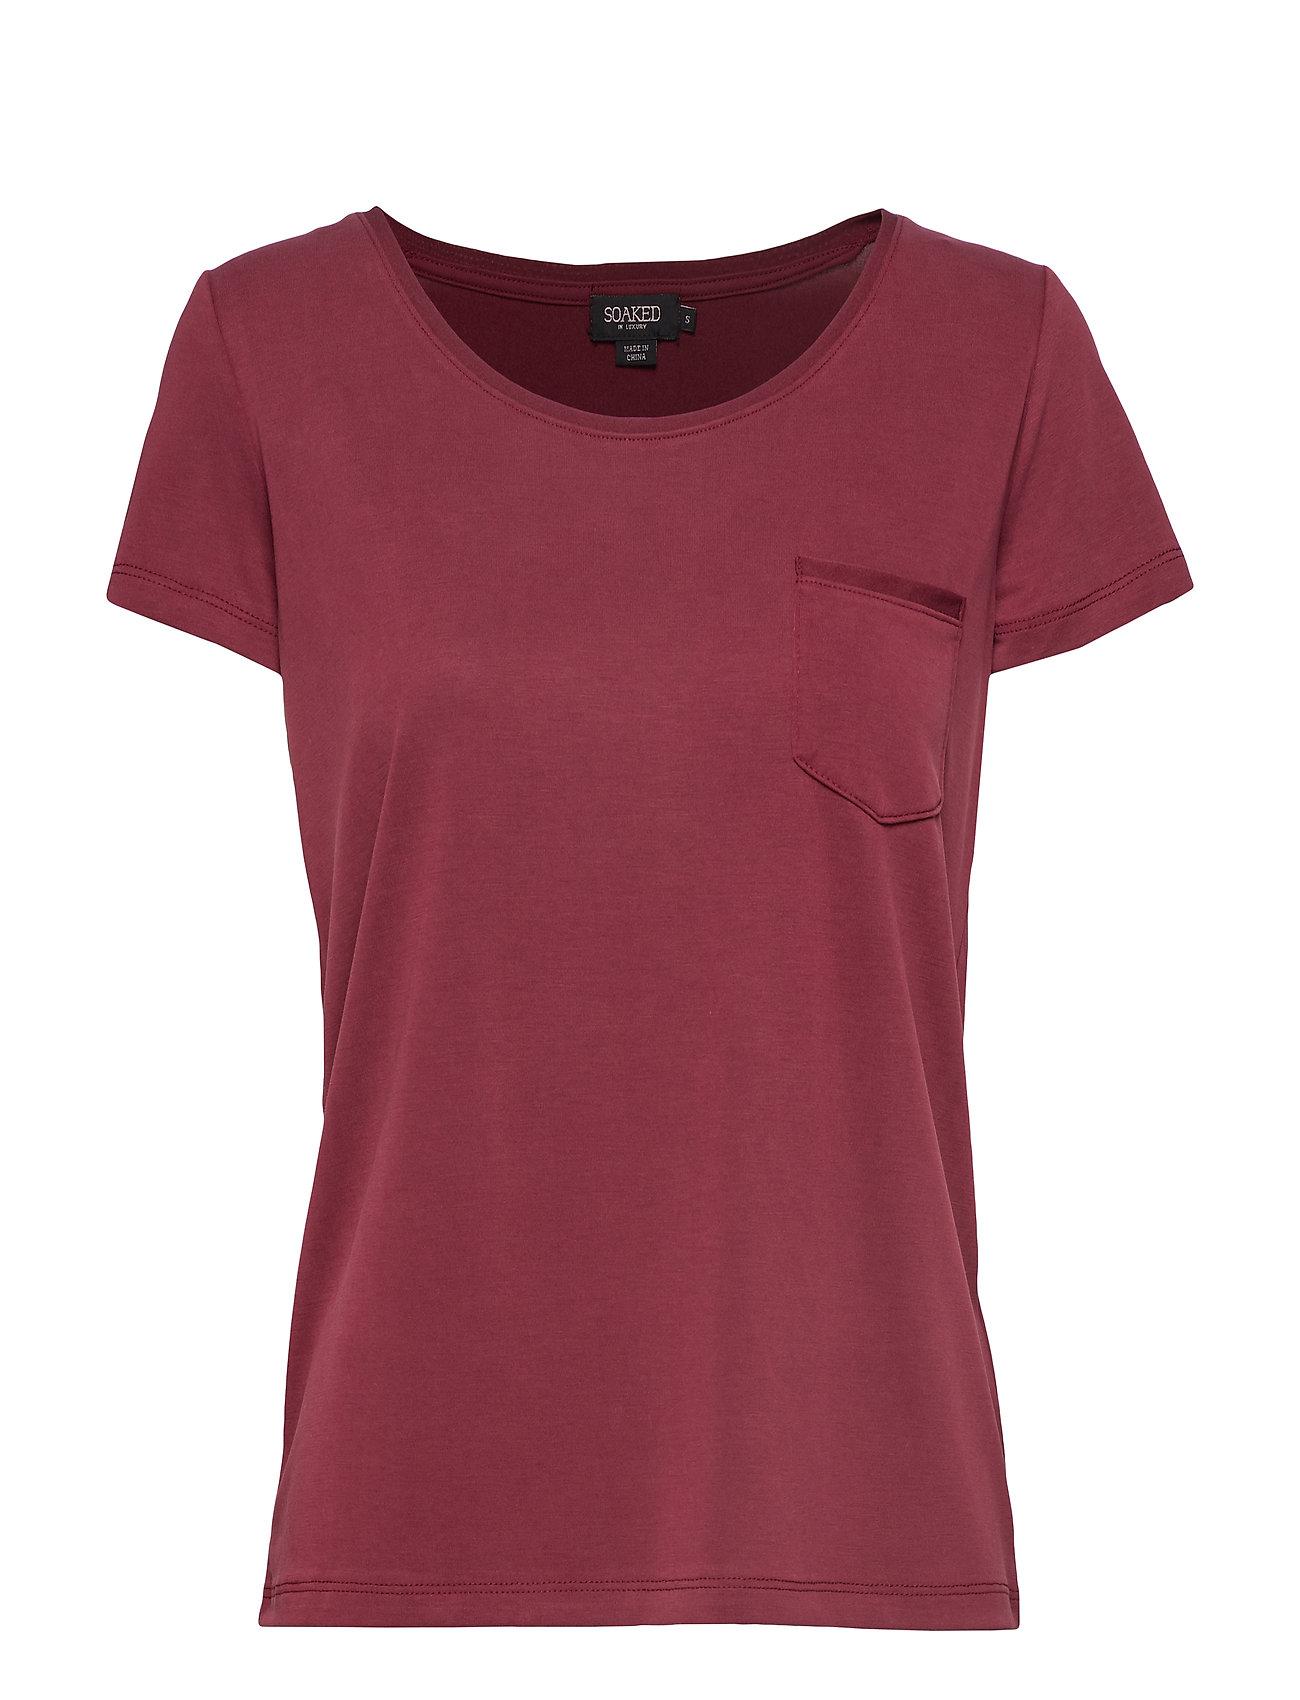 Image of Slcolumbine Tee T-shirt Top Soaked In Luxury (3452138997)